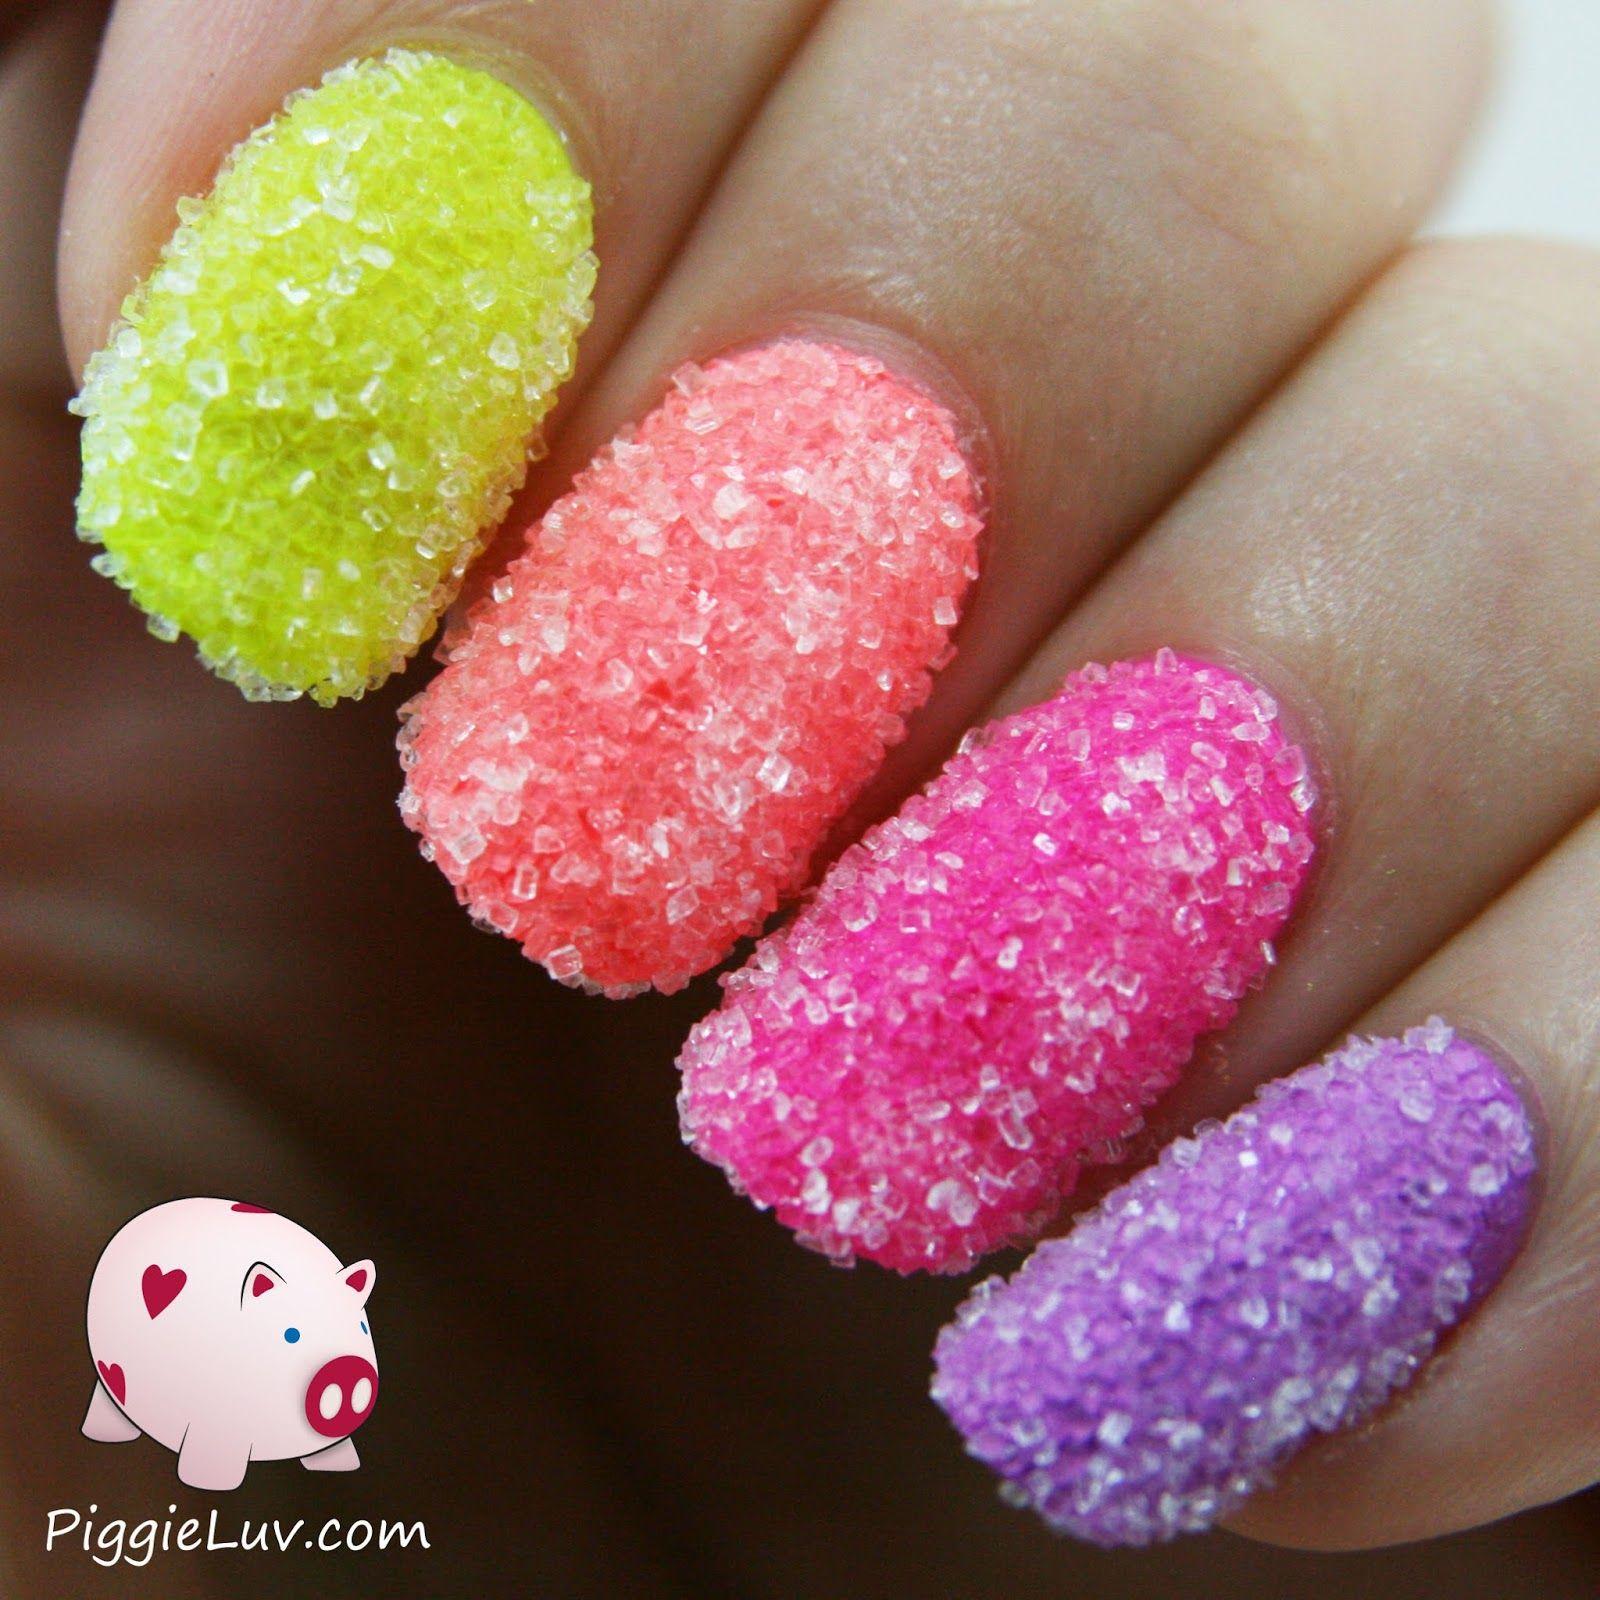 Piggieluv Rainbow Bubbles Nail Art: Nail Art Designs, Sugar Nails